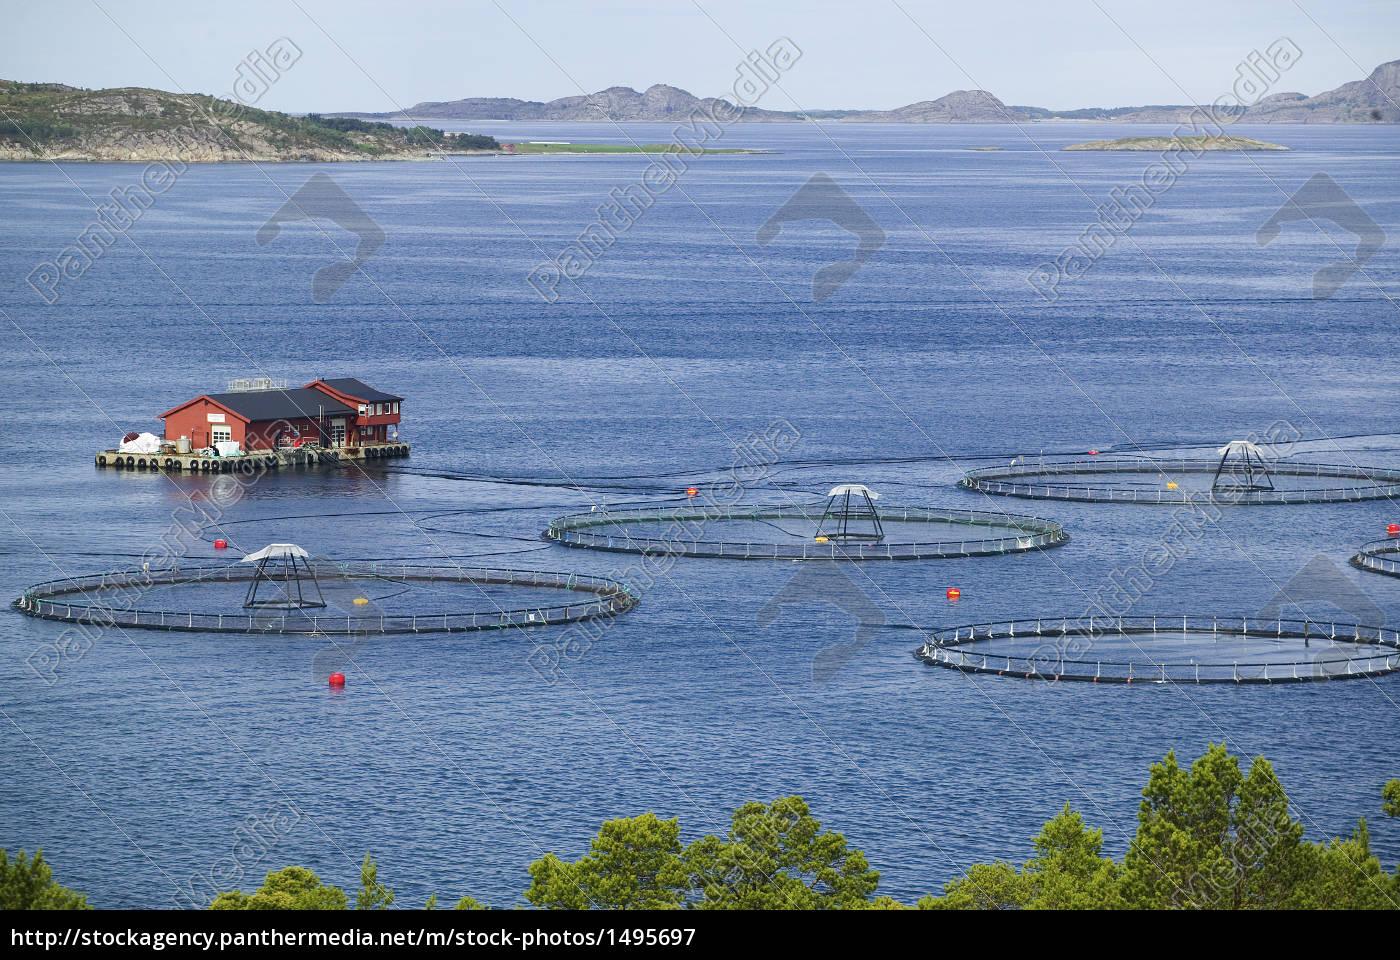 fischfarm netzgehege im fjord norwegen lizenzfreies bild 1495697 bildagentur panthermedia. Black Bedroom Furniture Sets. Home Design Ideas